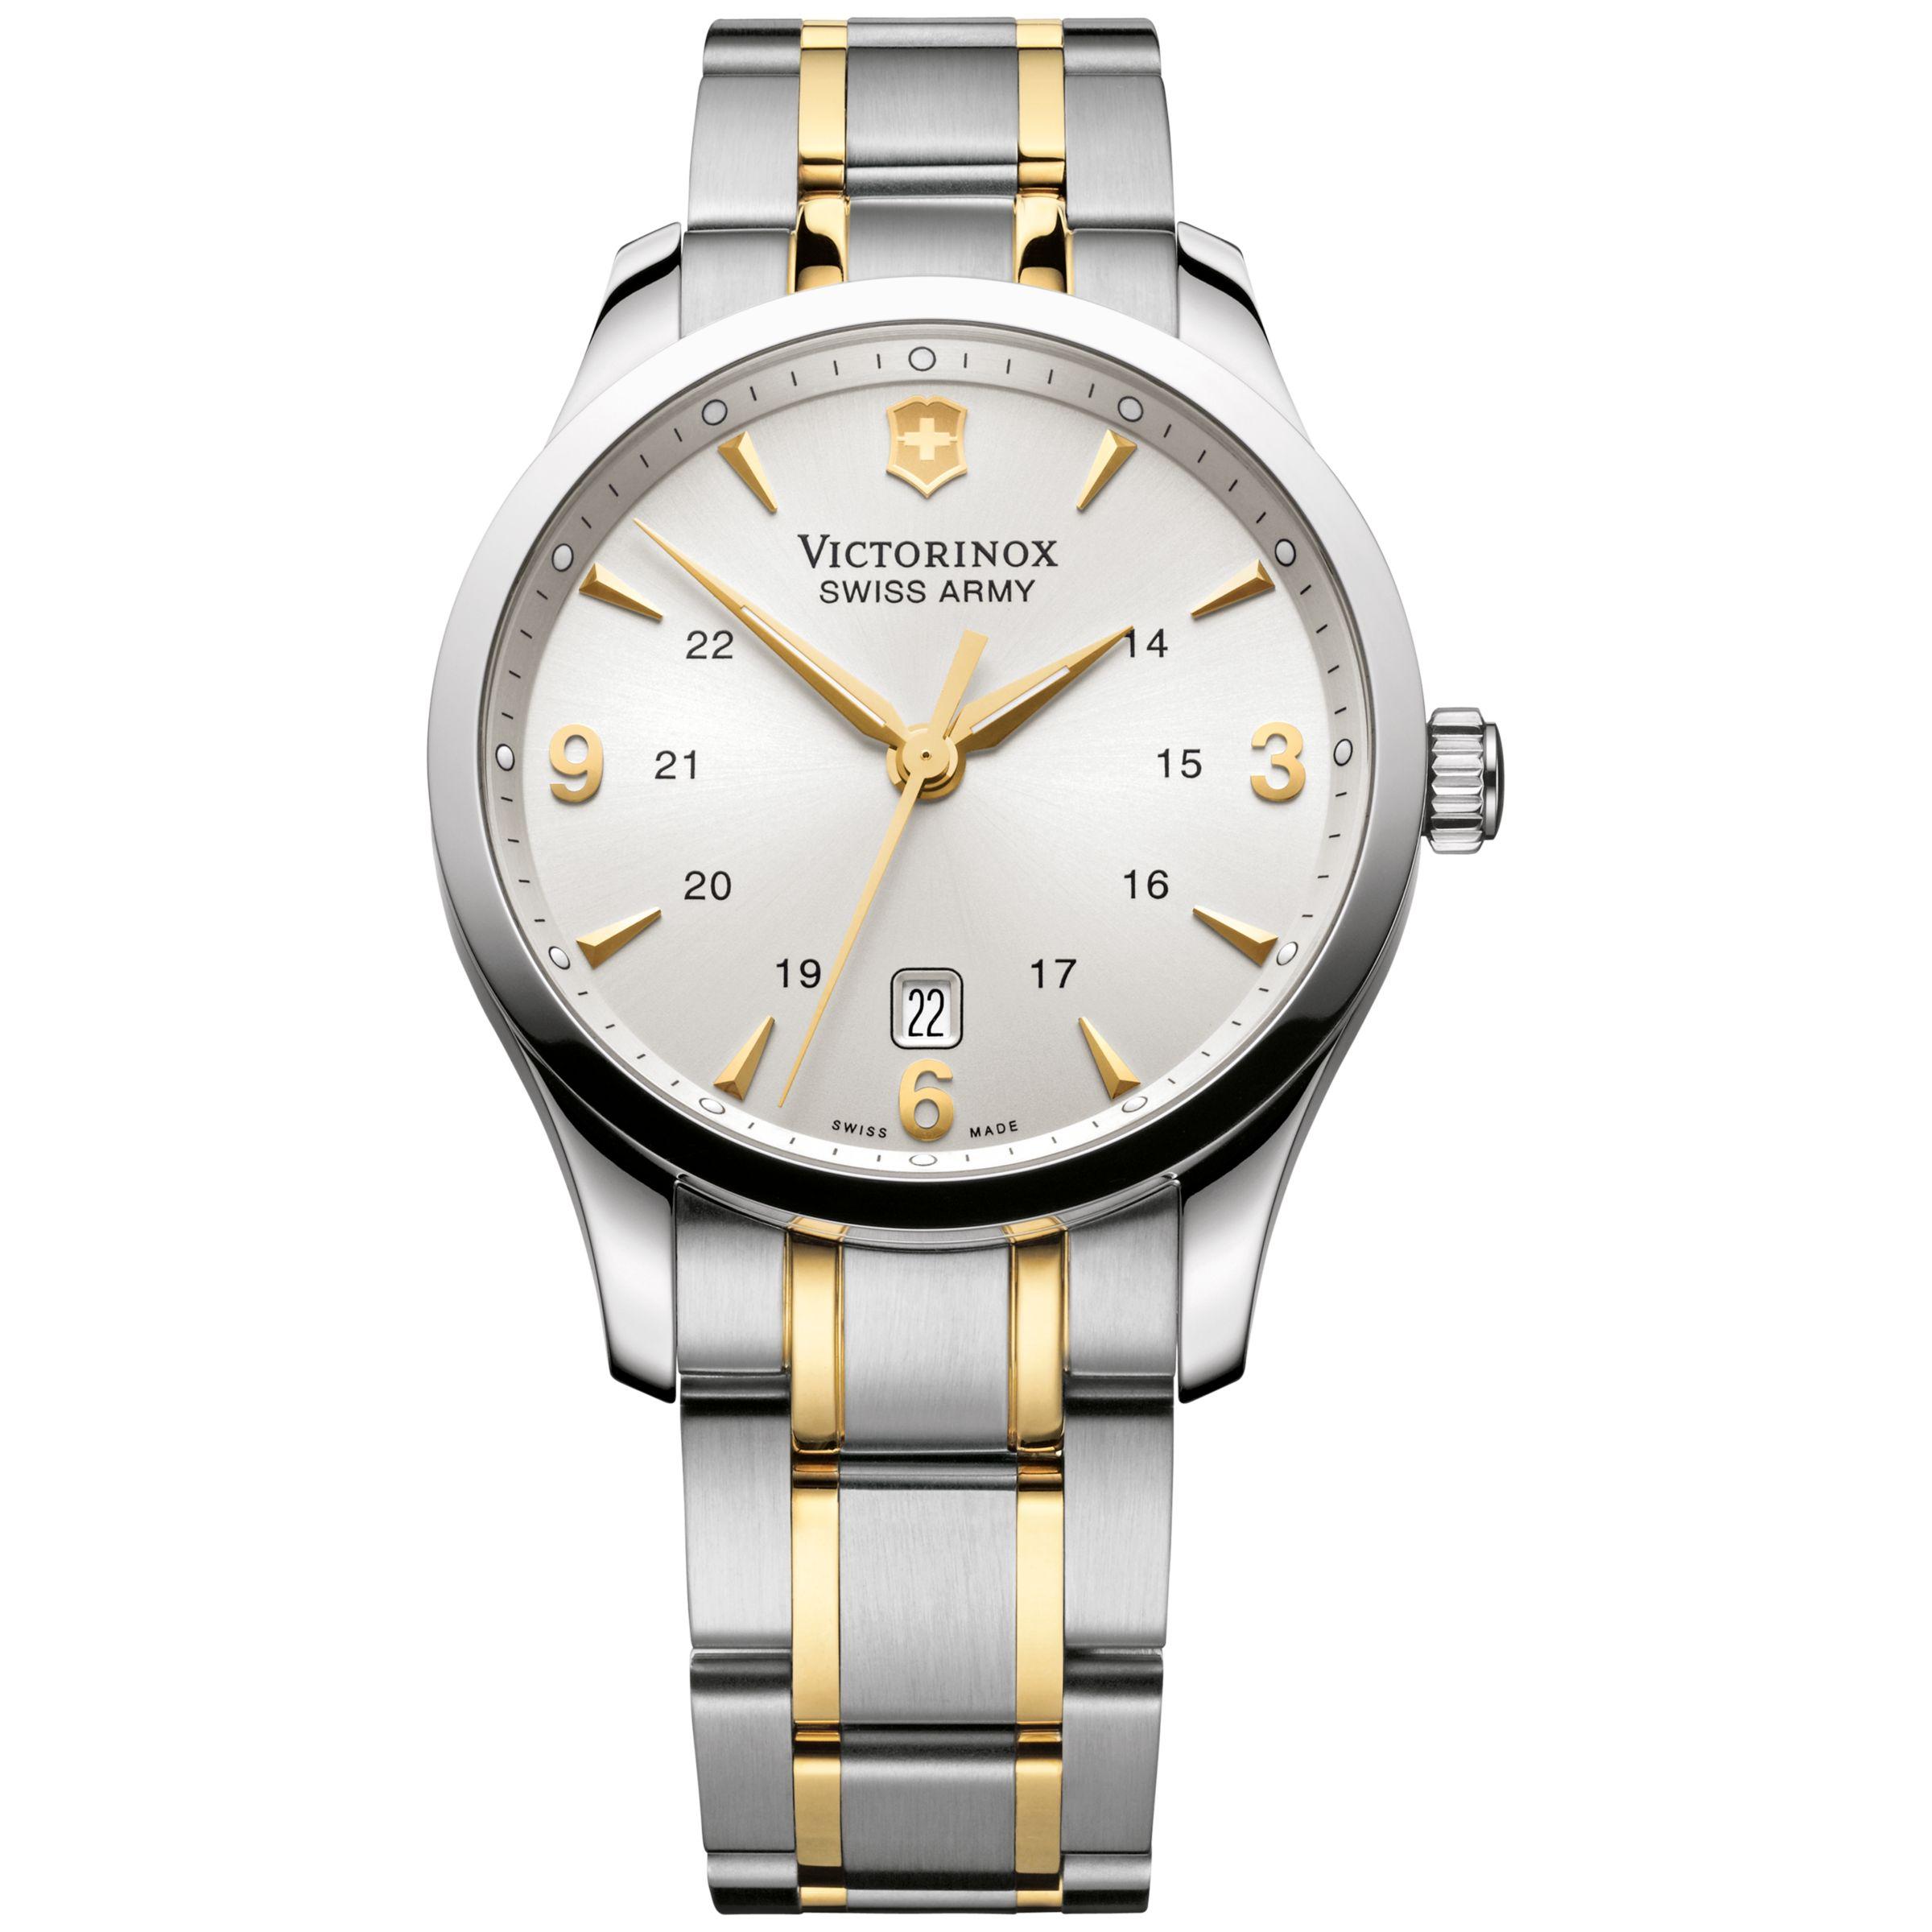 Victorinox Victorinox 241477 Men's Alliance Two Tone Bracelet Strap Watch, Silver/Gold